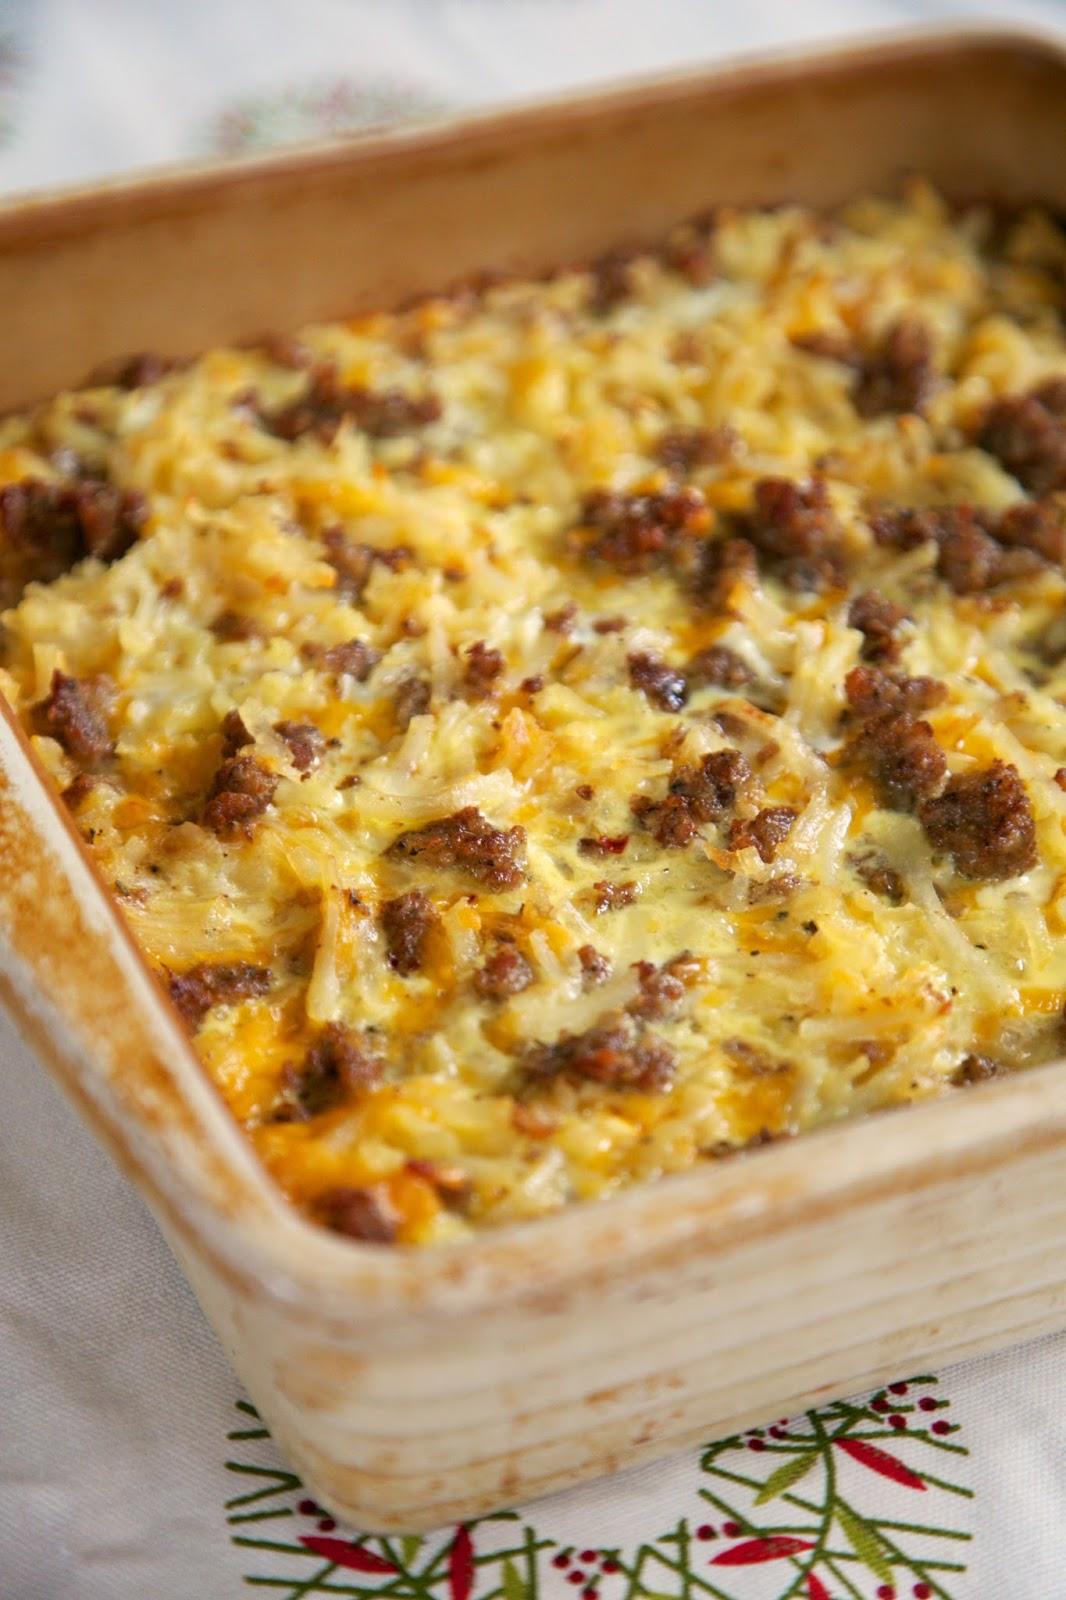 Breakfast sausage egg and potato casserole recipes